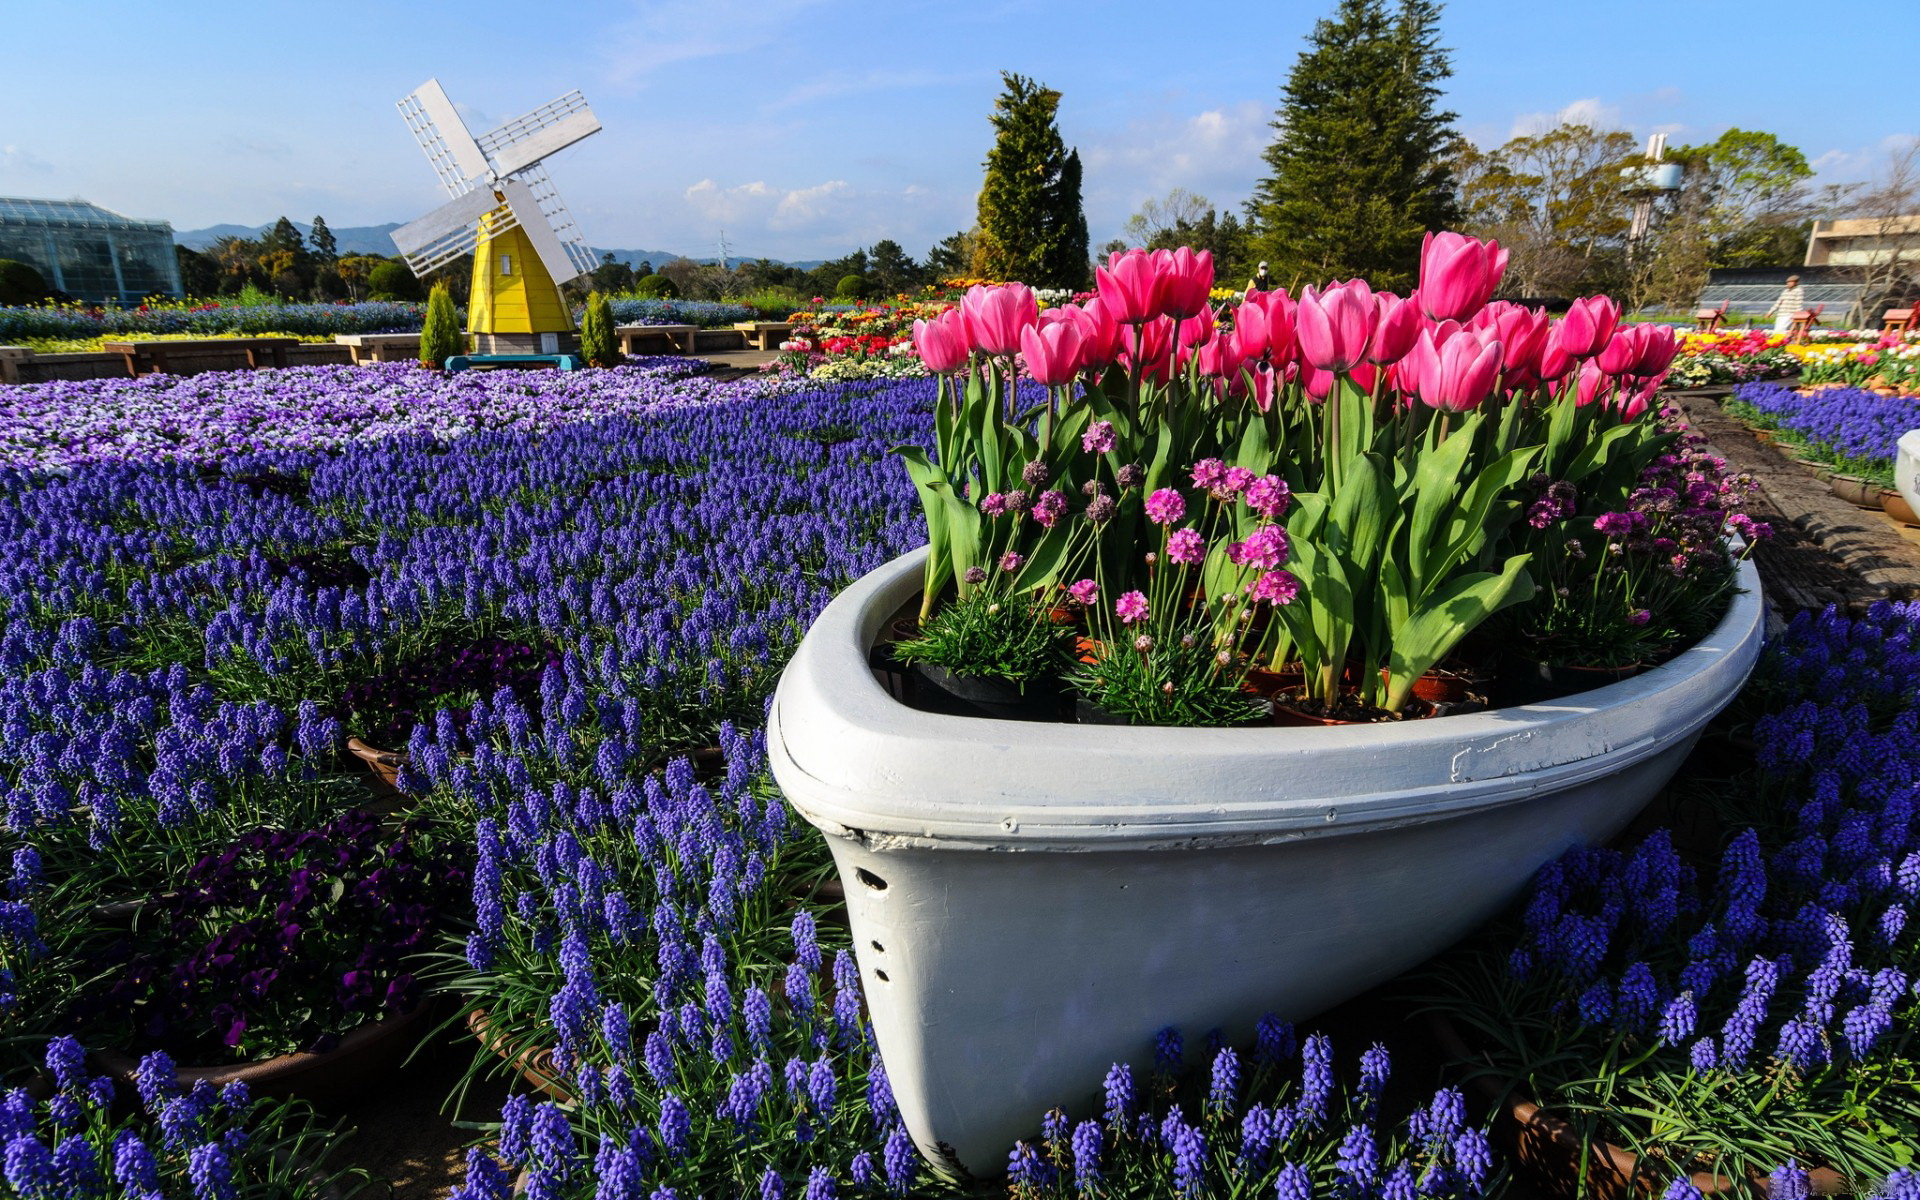 Jardin fonds d 39 cran arri res plan 1920x1200 id 409846 - Fond d ecran jardin anglais ...